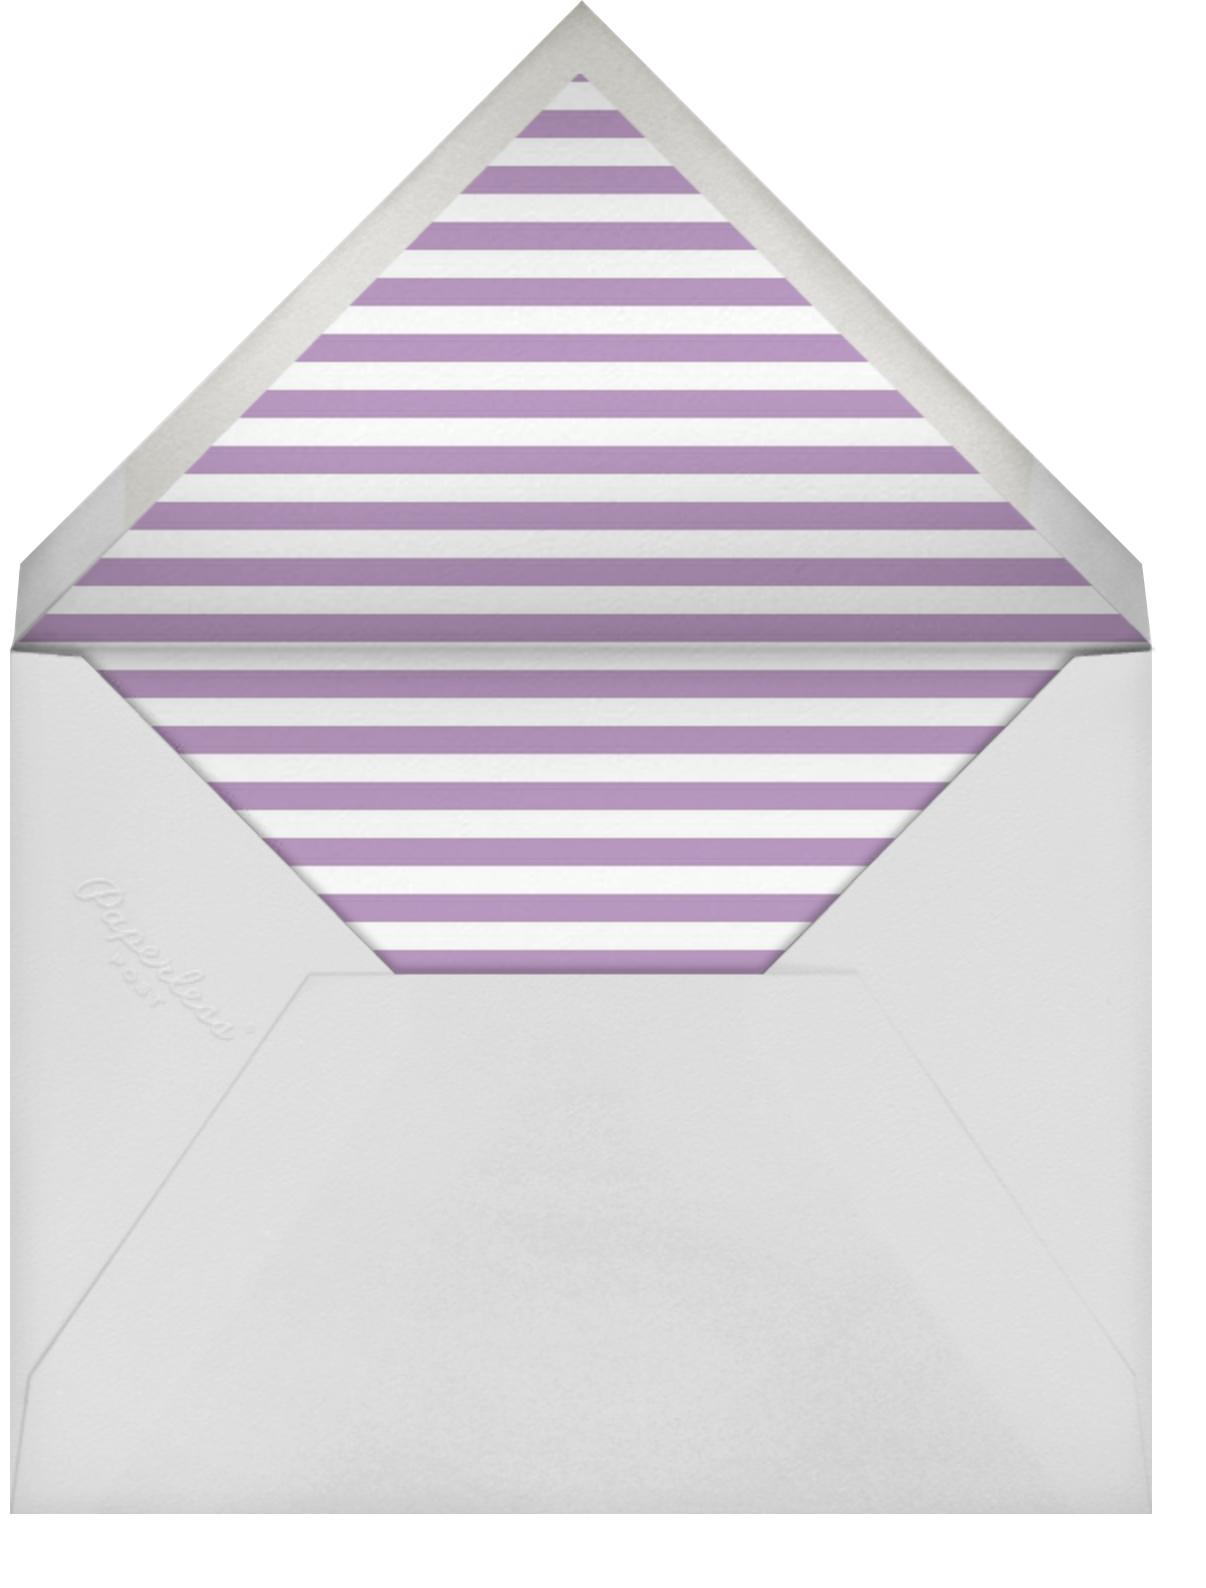 Zebra Stripes (Eggplant)  - Paperless Post - Adult birthday - envelope back